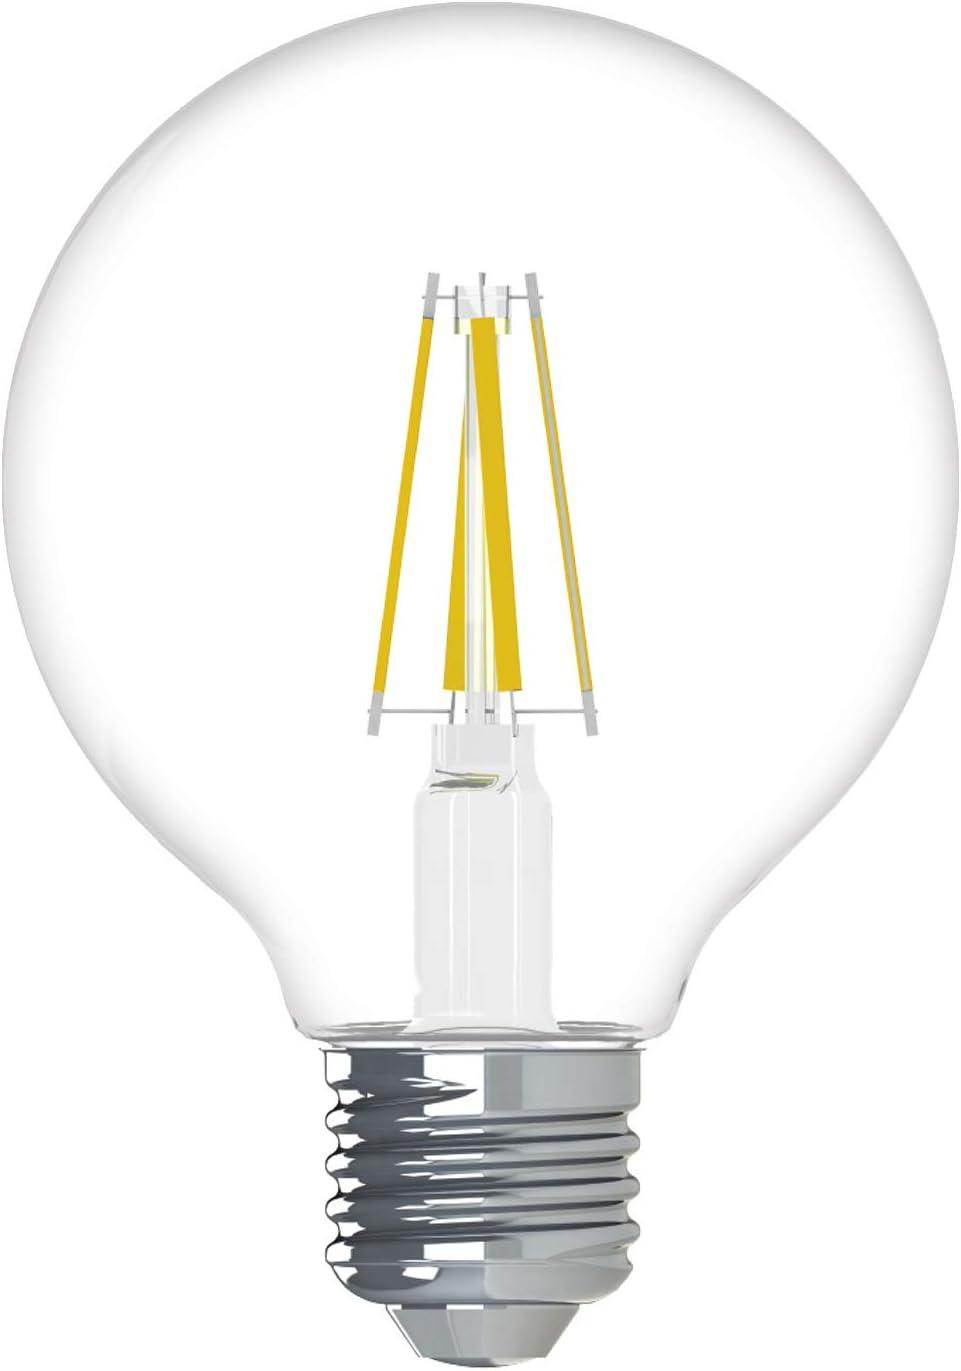 GE Lighting Relax Regular store HD Globe Dimmable LED Bulbs Max 51% OFF Light Rep Watt 60